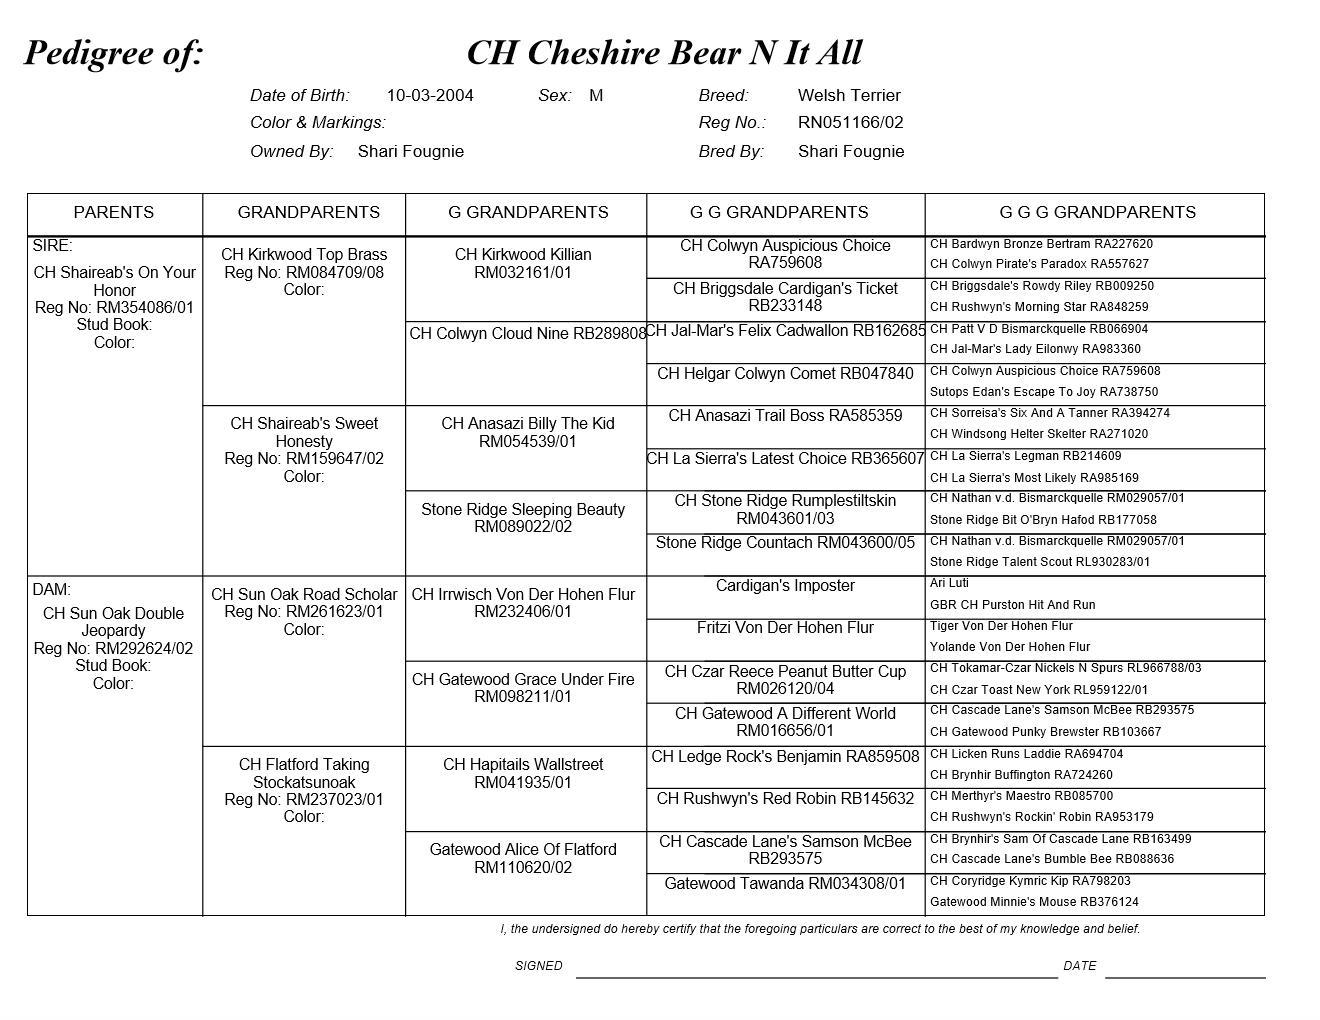 CH Cheshire Bear N It All's Pedigree